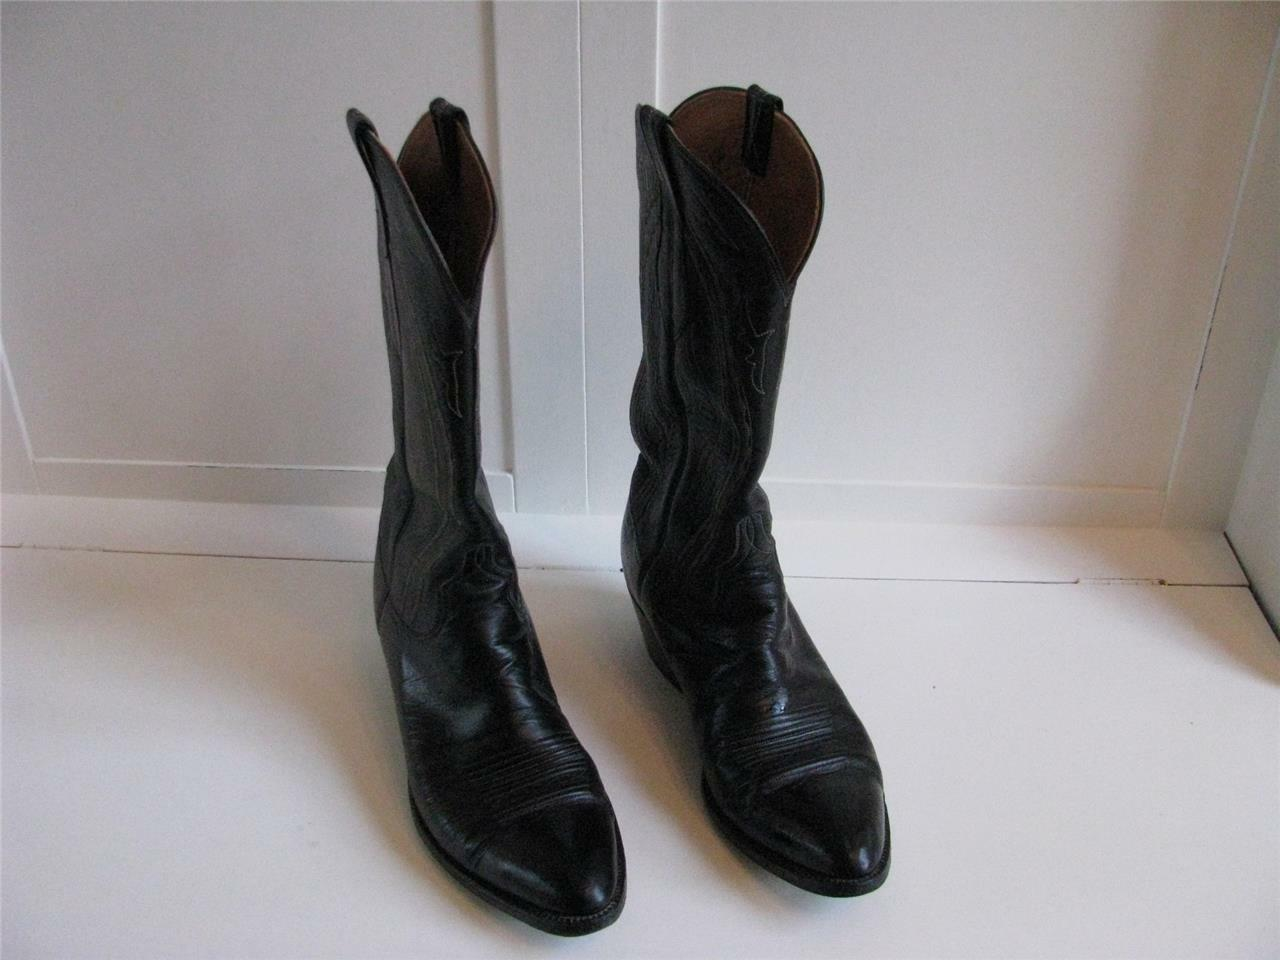 Lucchese Cowboy bottes en Cuir noir San Antonio 10B Fantaisie Couture